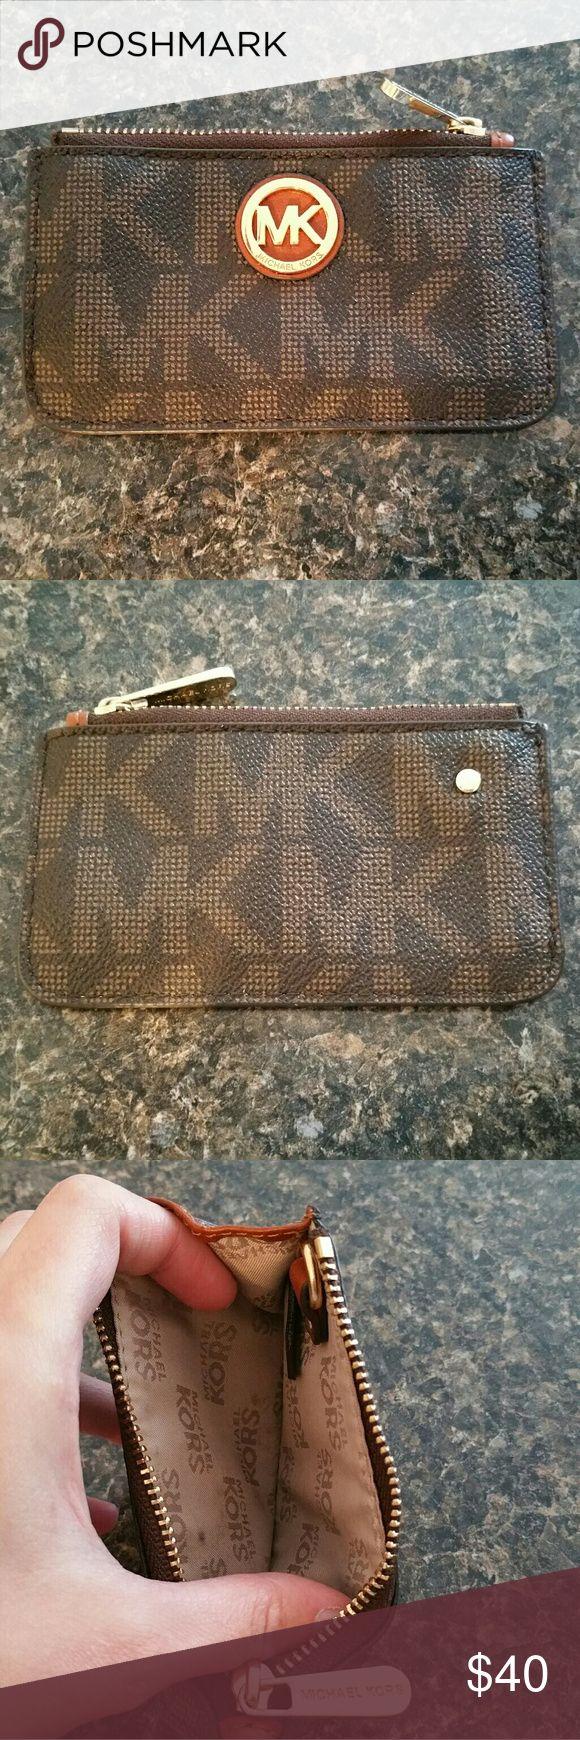 Michael kors coin purse Michael kors coin purse. Excellent condition! Michael Kors Bags Wallets